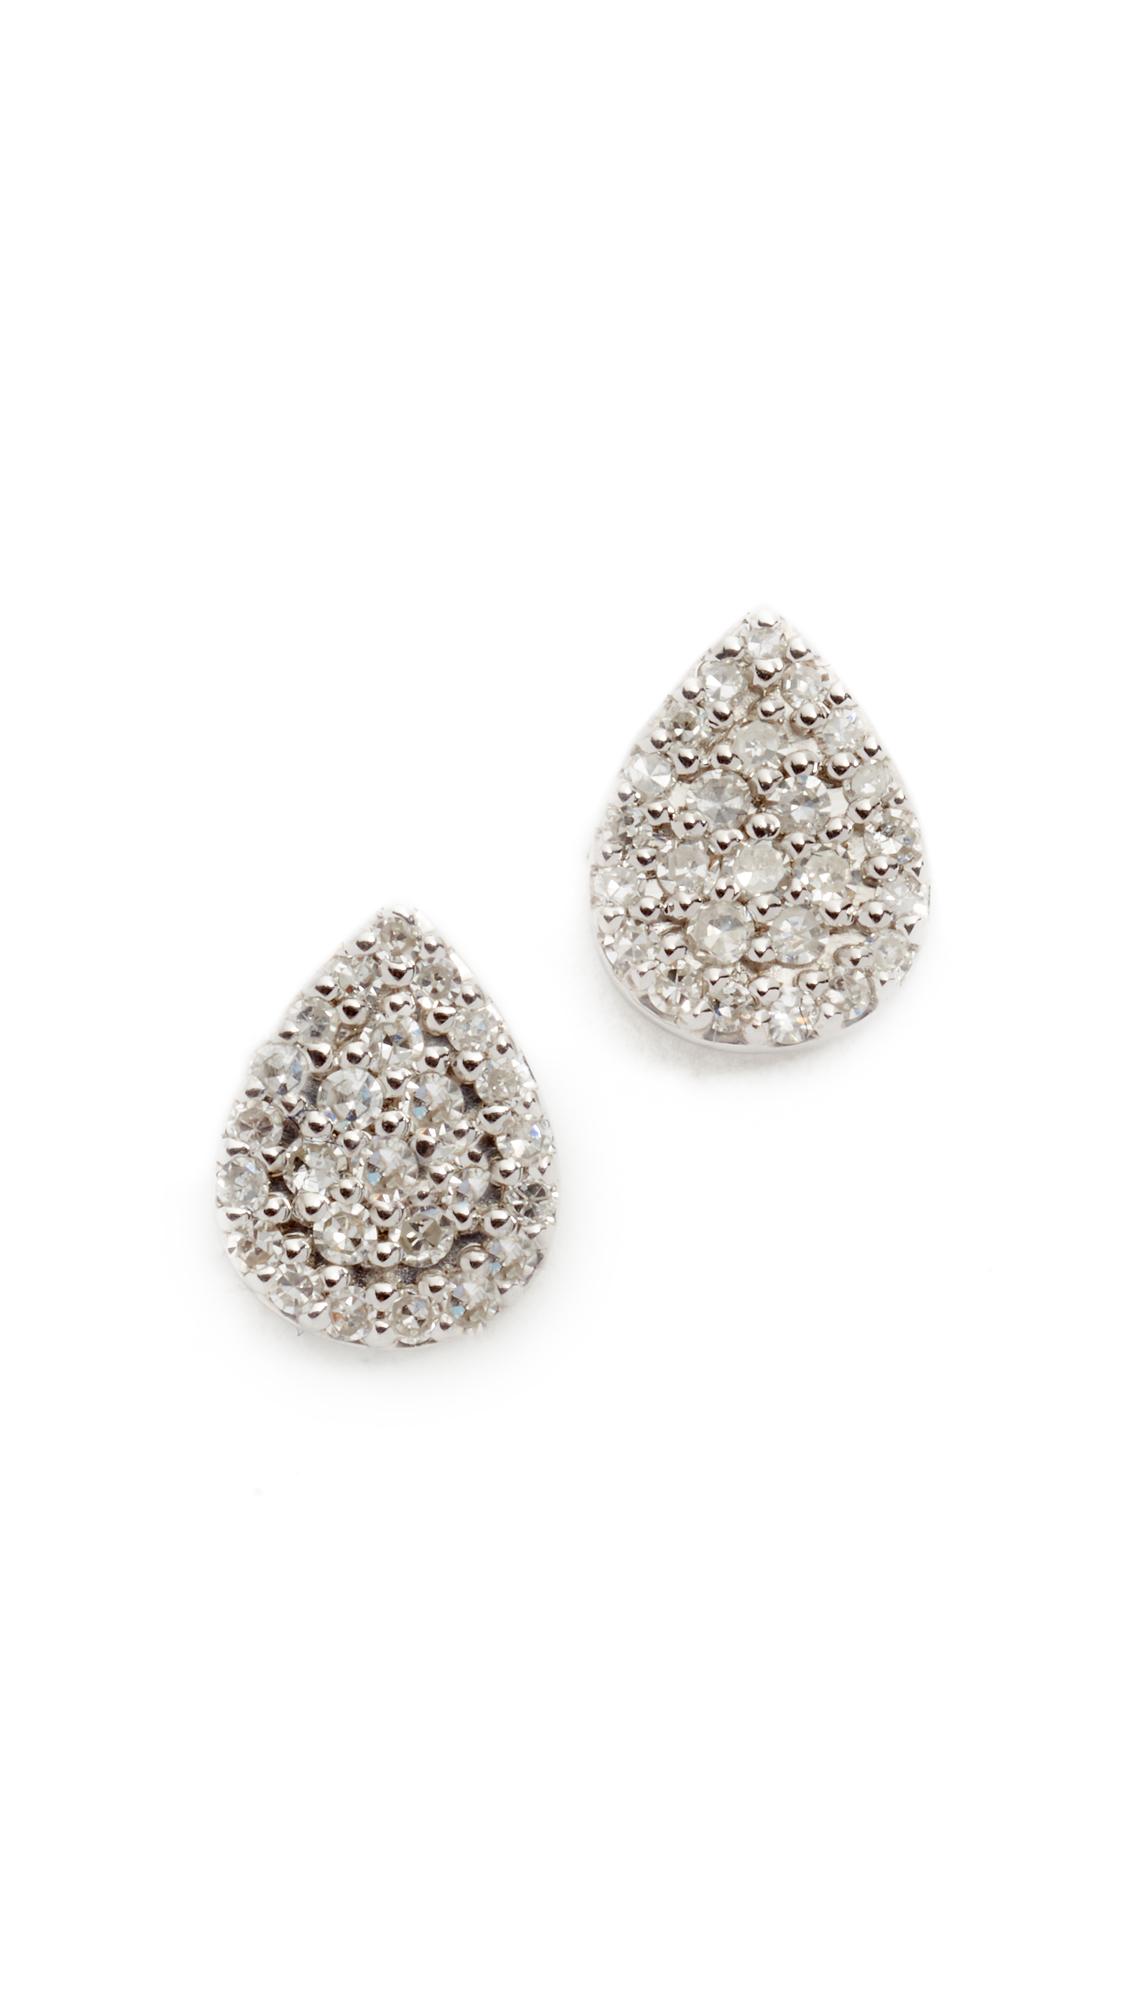 Adina Reyter Solid Pave Teardrop Stud Earrings - Sterling Silver